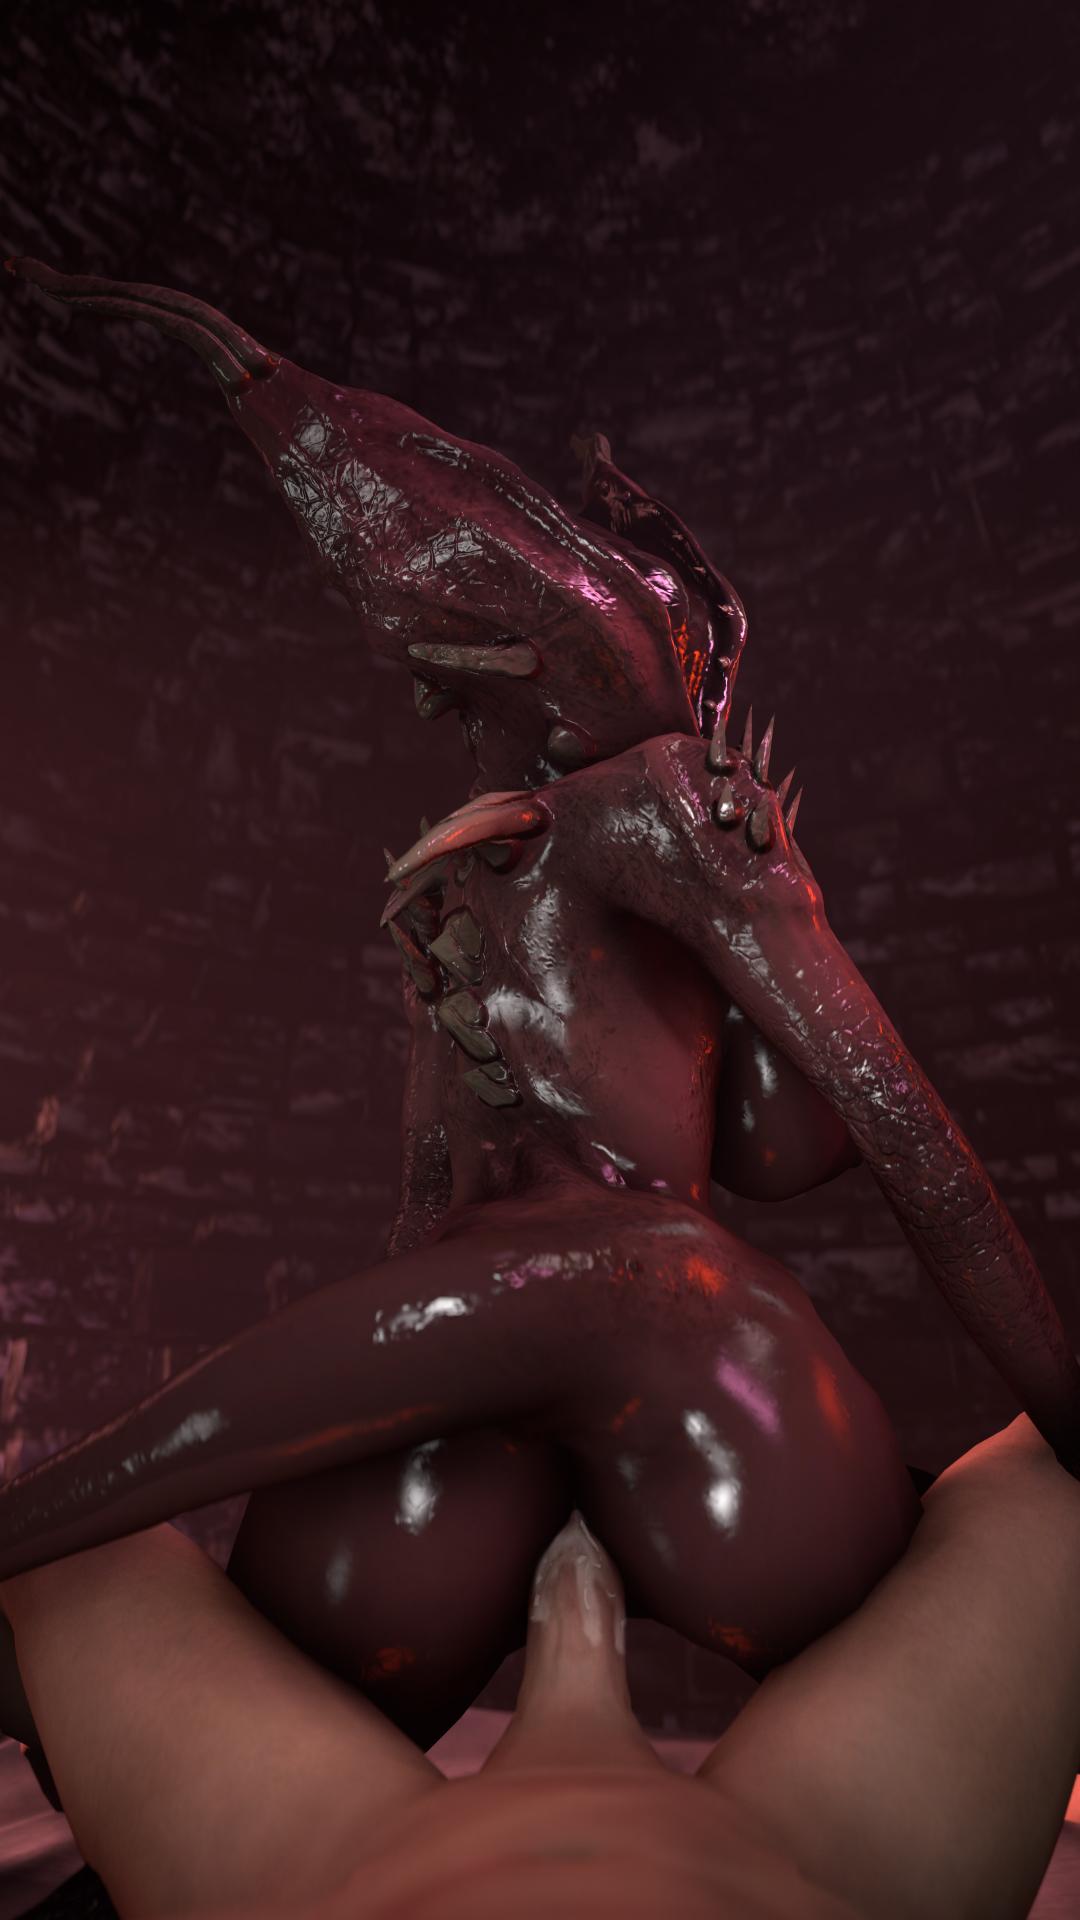 Agony demon sex long gifs 108060